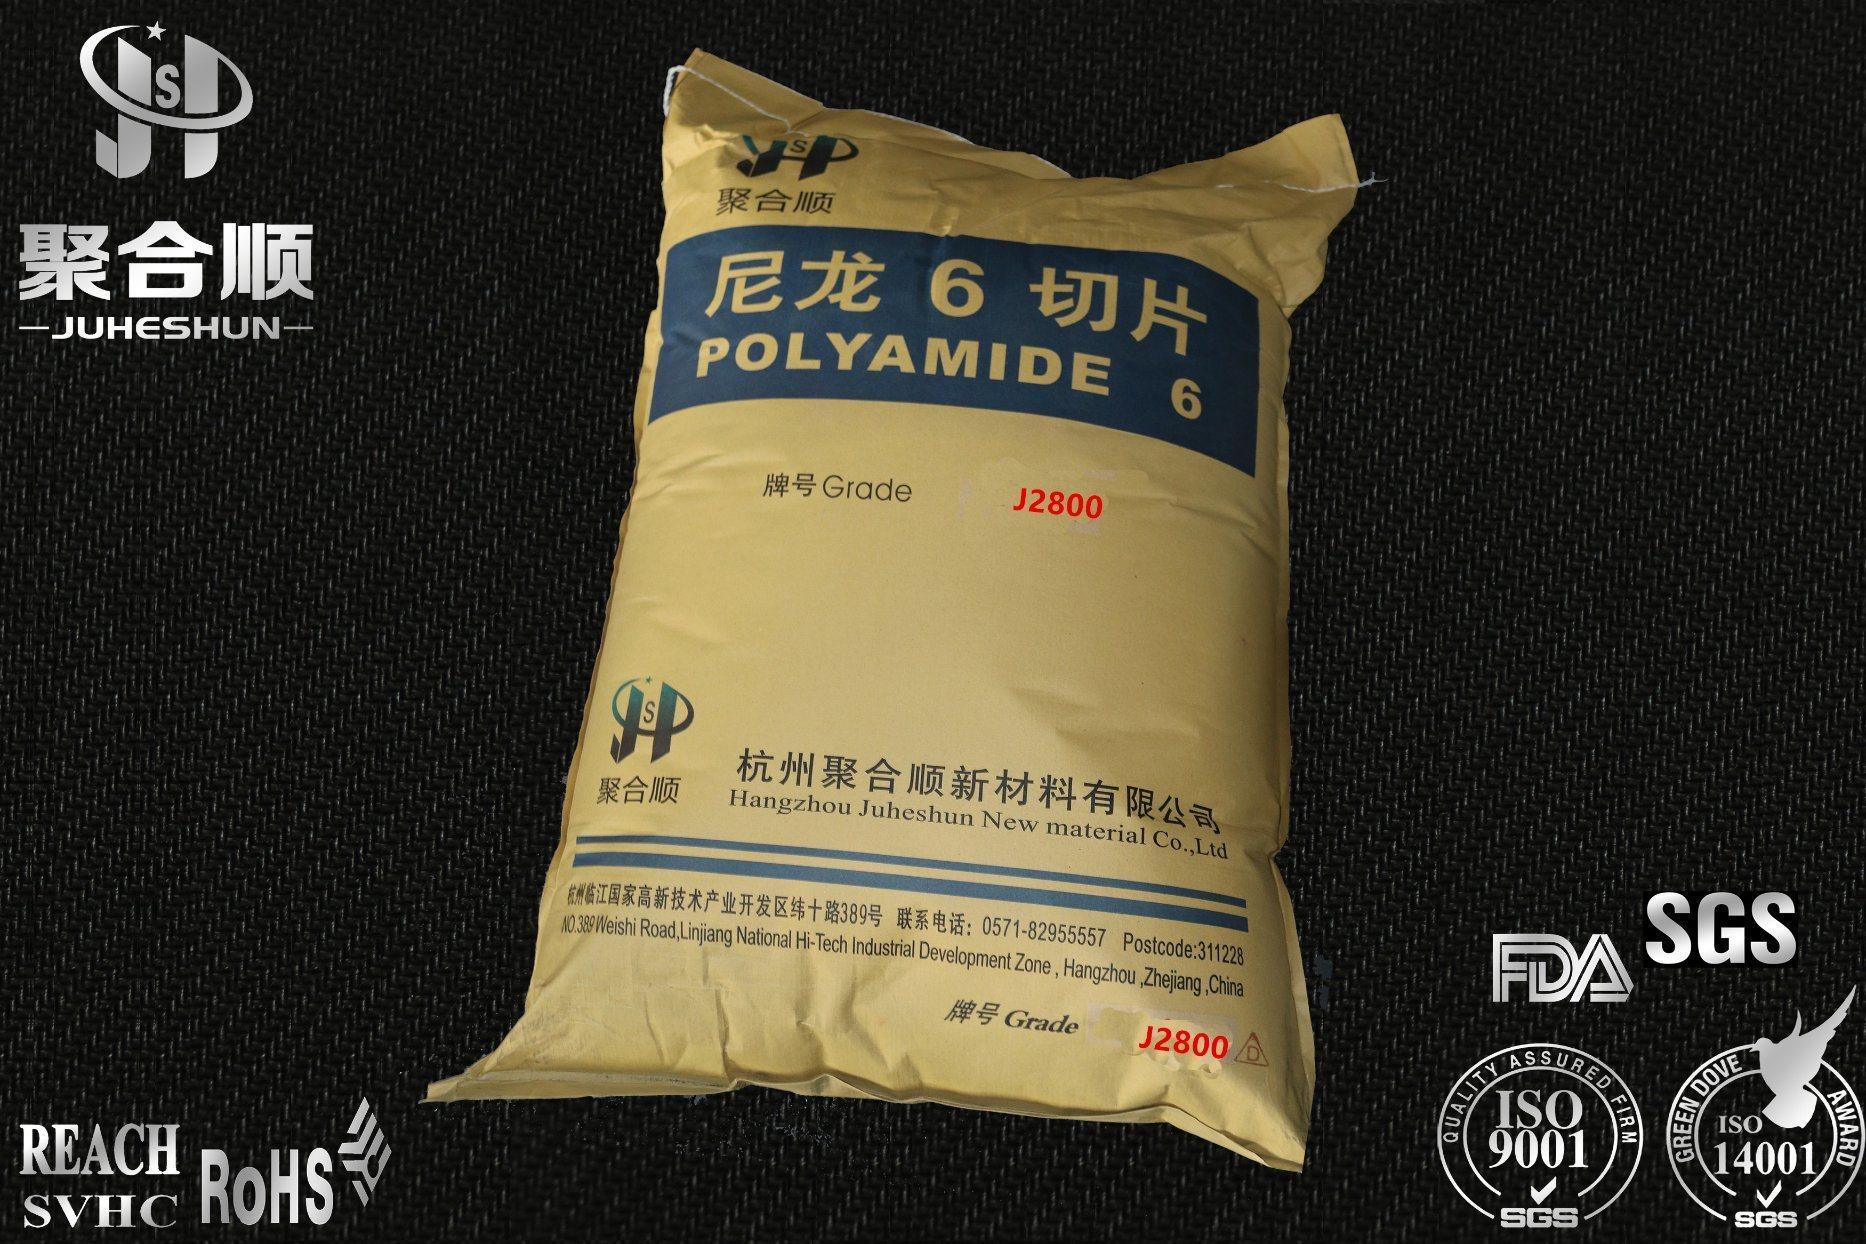 J2800/Nylon 6 Chips/ Polyamide-6 Granules/ Engineering Grade Nylon 6 Chips/PA 6